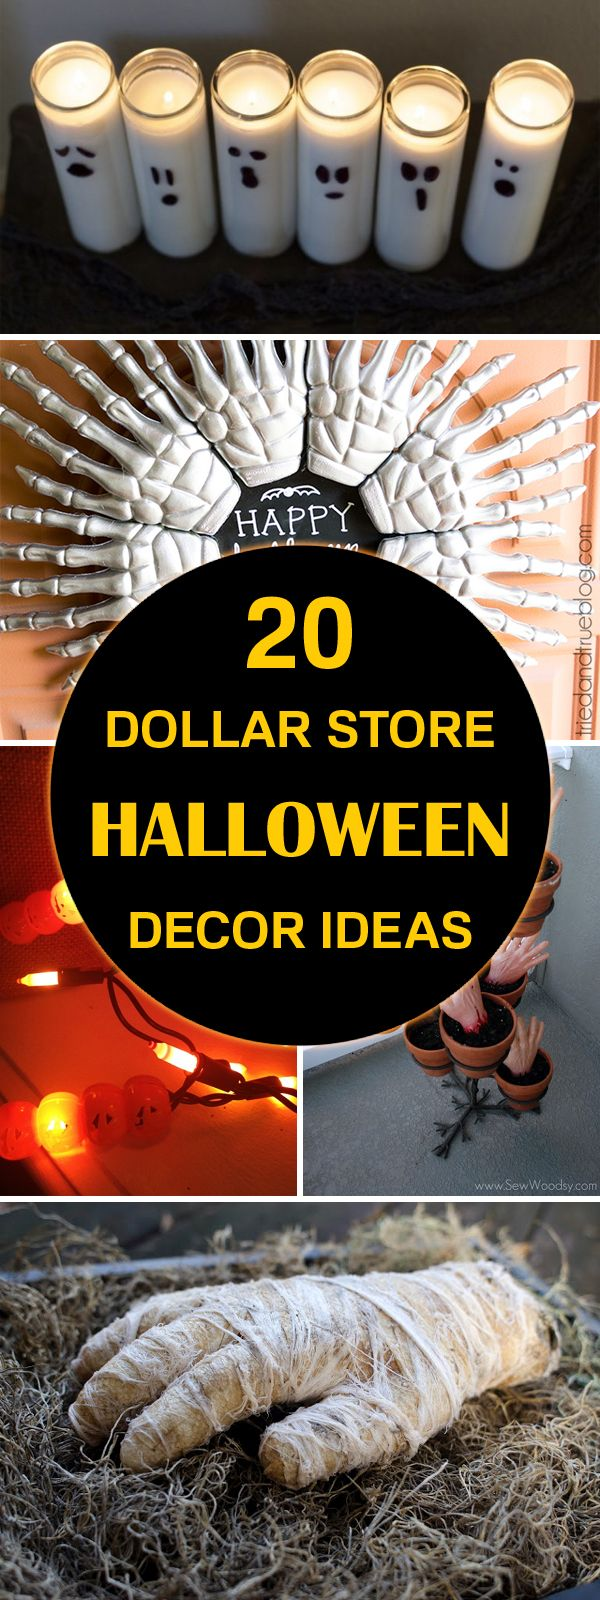 Halloween decorations ideas diy - Halloween Decorations Ideas Diy 12